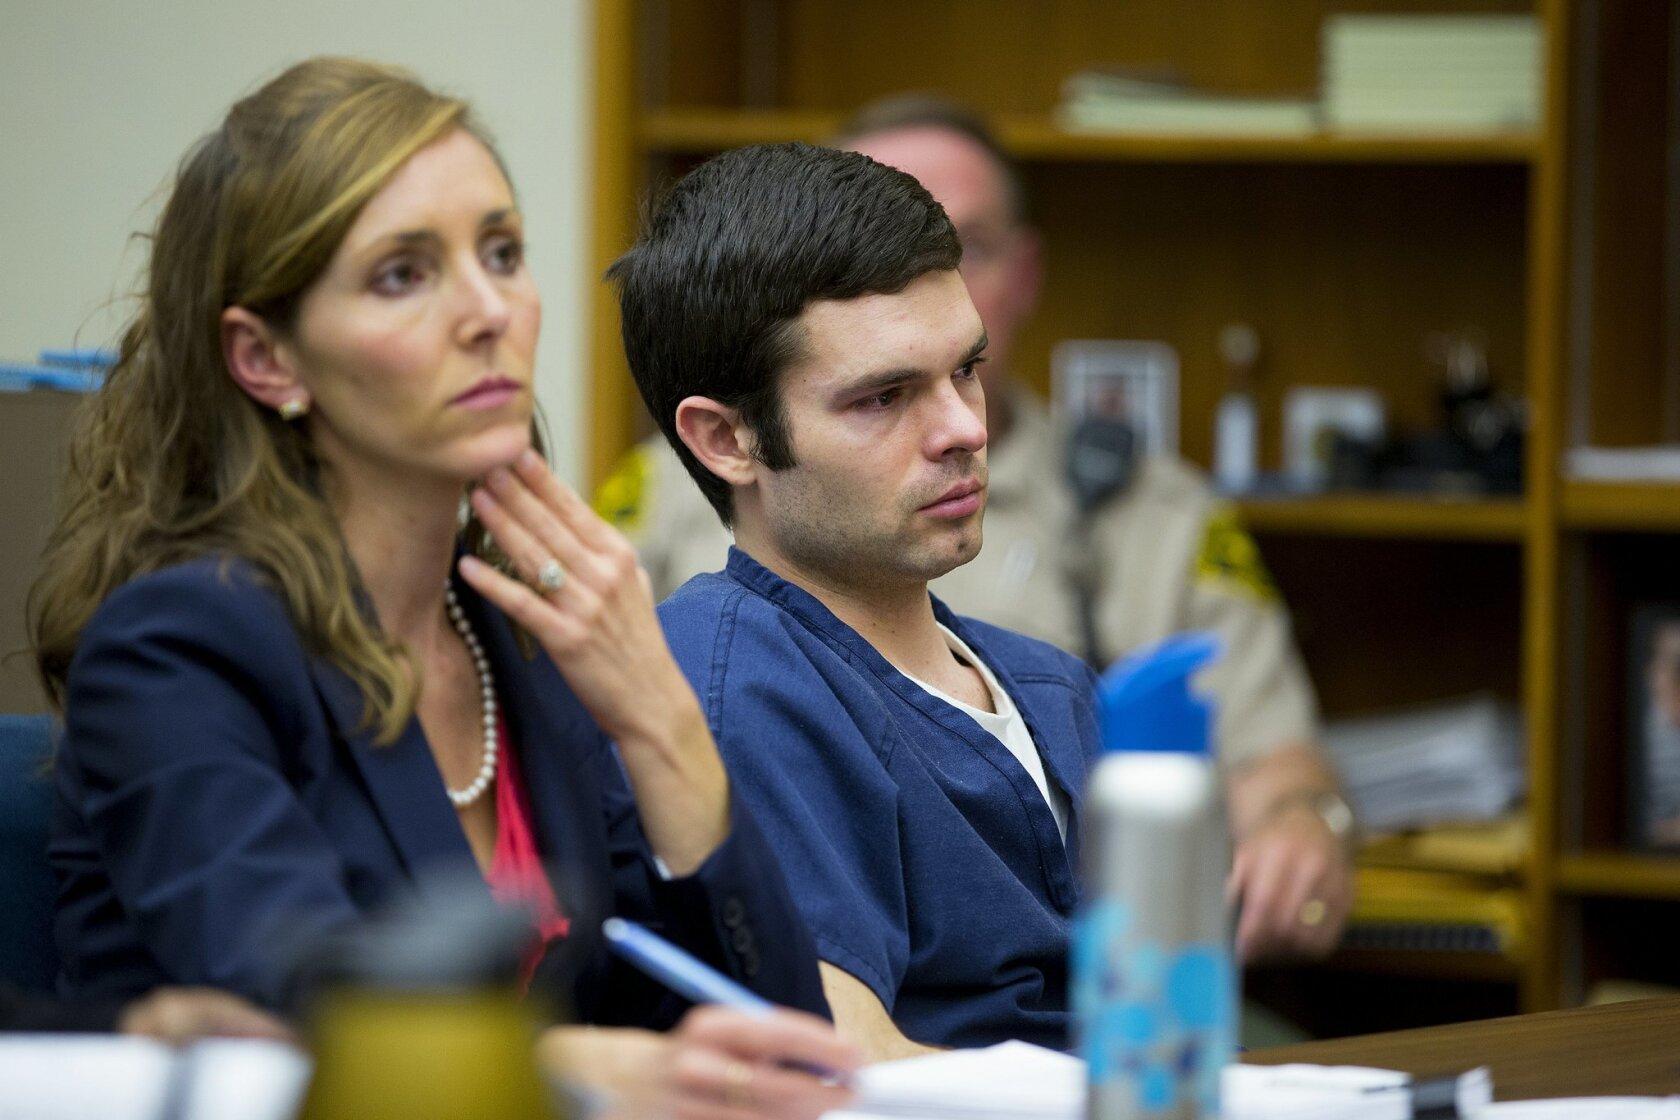 Sentence revised for revenge porn site operator - The San Diego